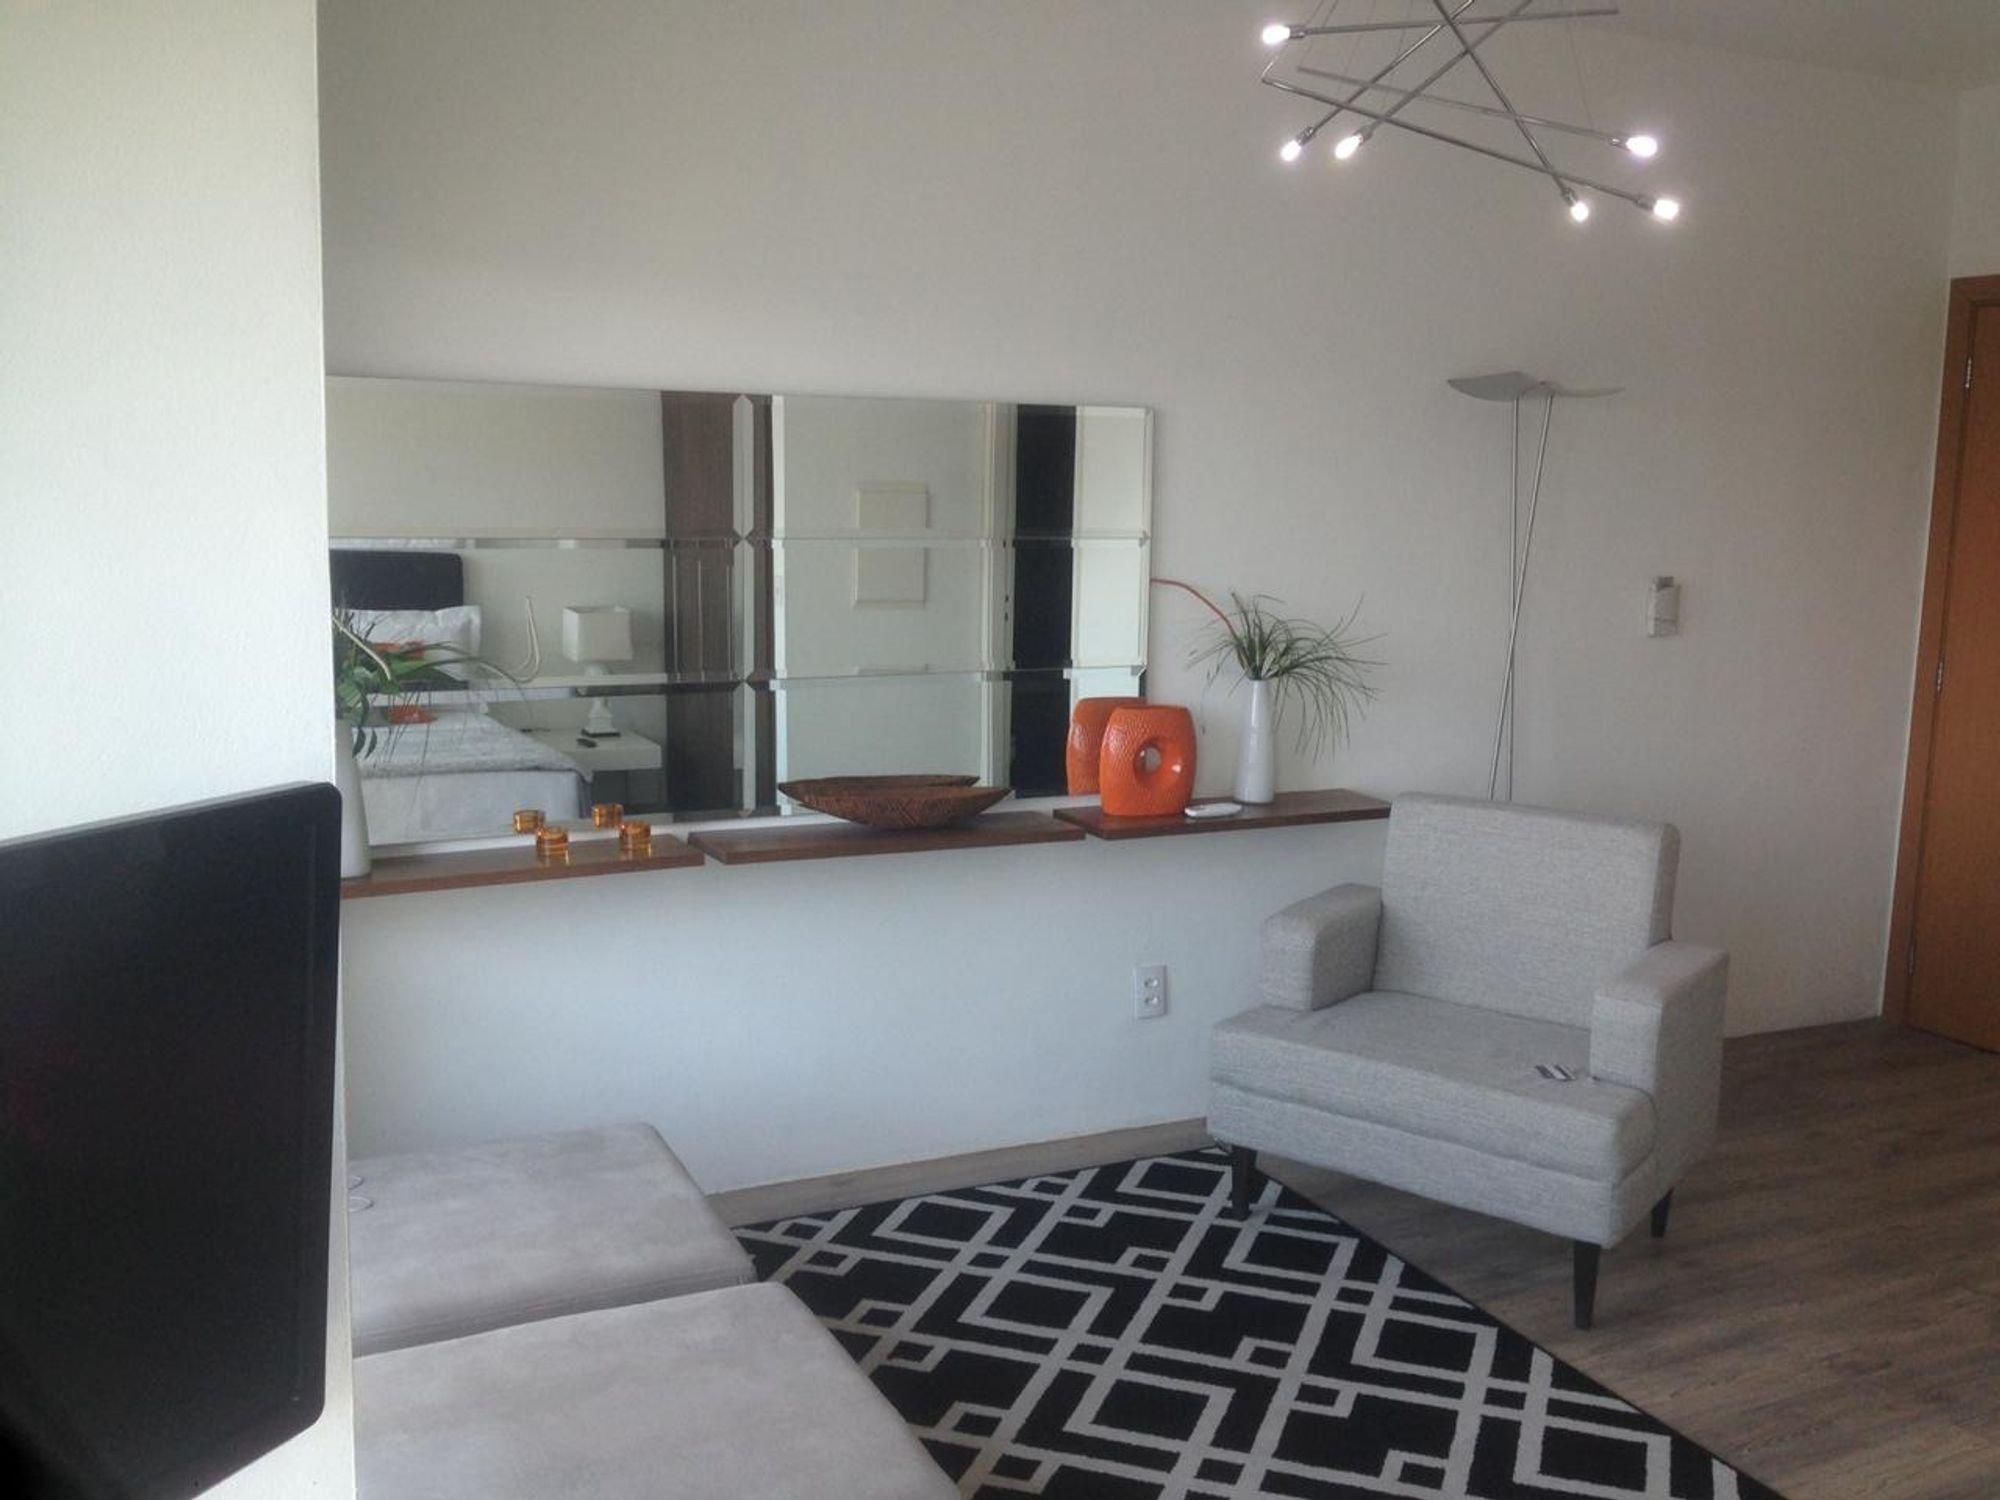 Foto de Sala com vaso de planta, televisão, vaso, tigela, cadeira